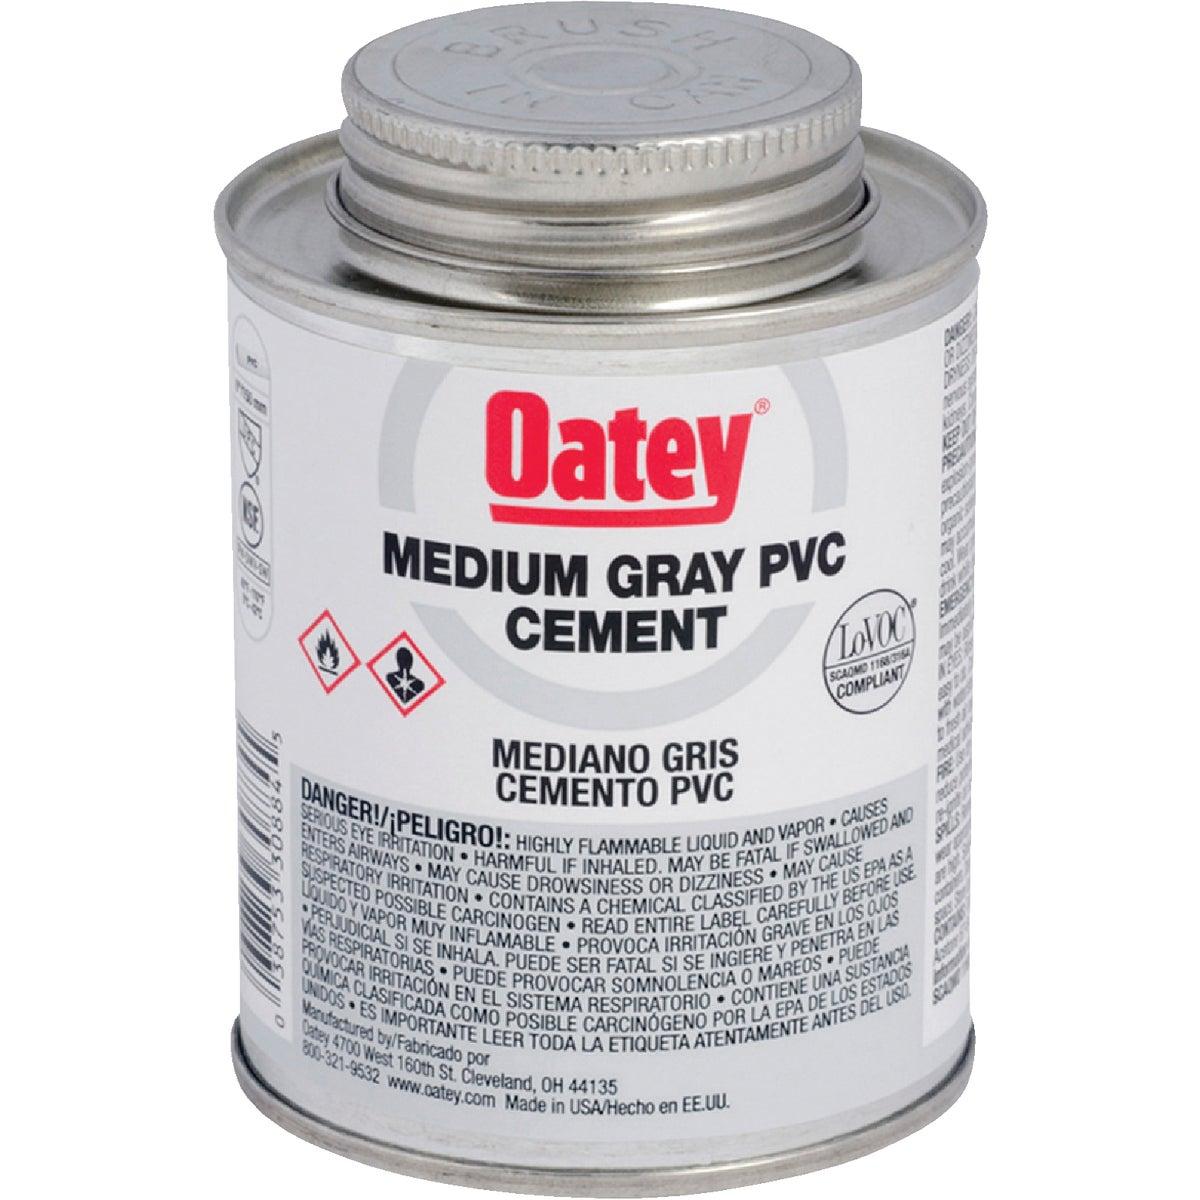 Oatey QT GRAY PVC CEMENT 30886